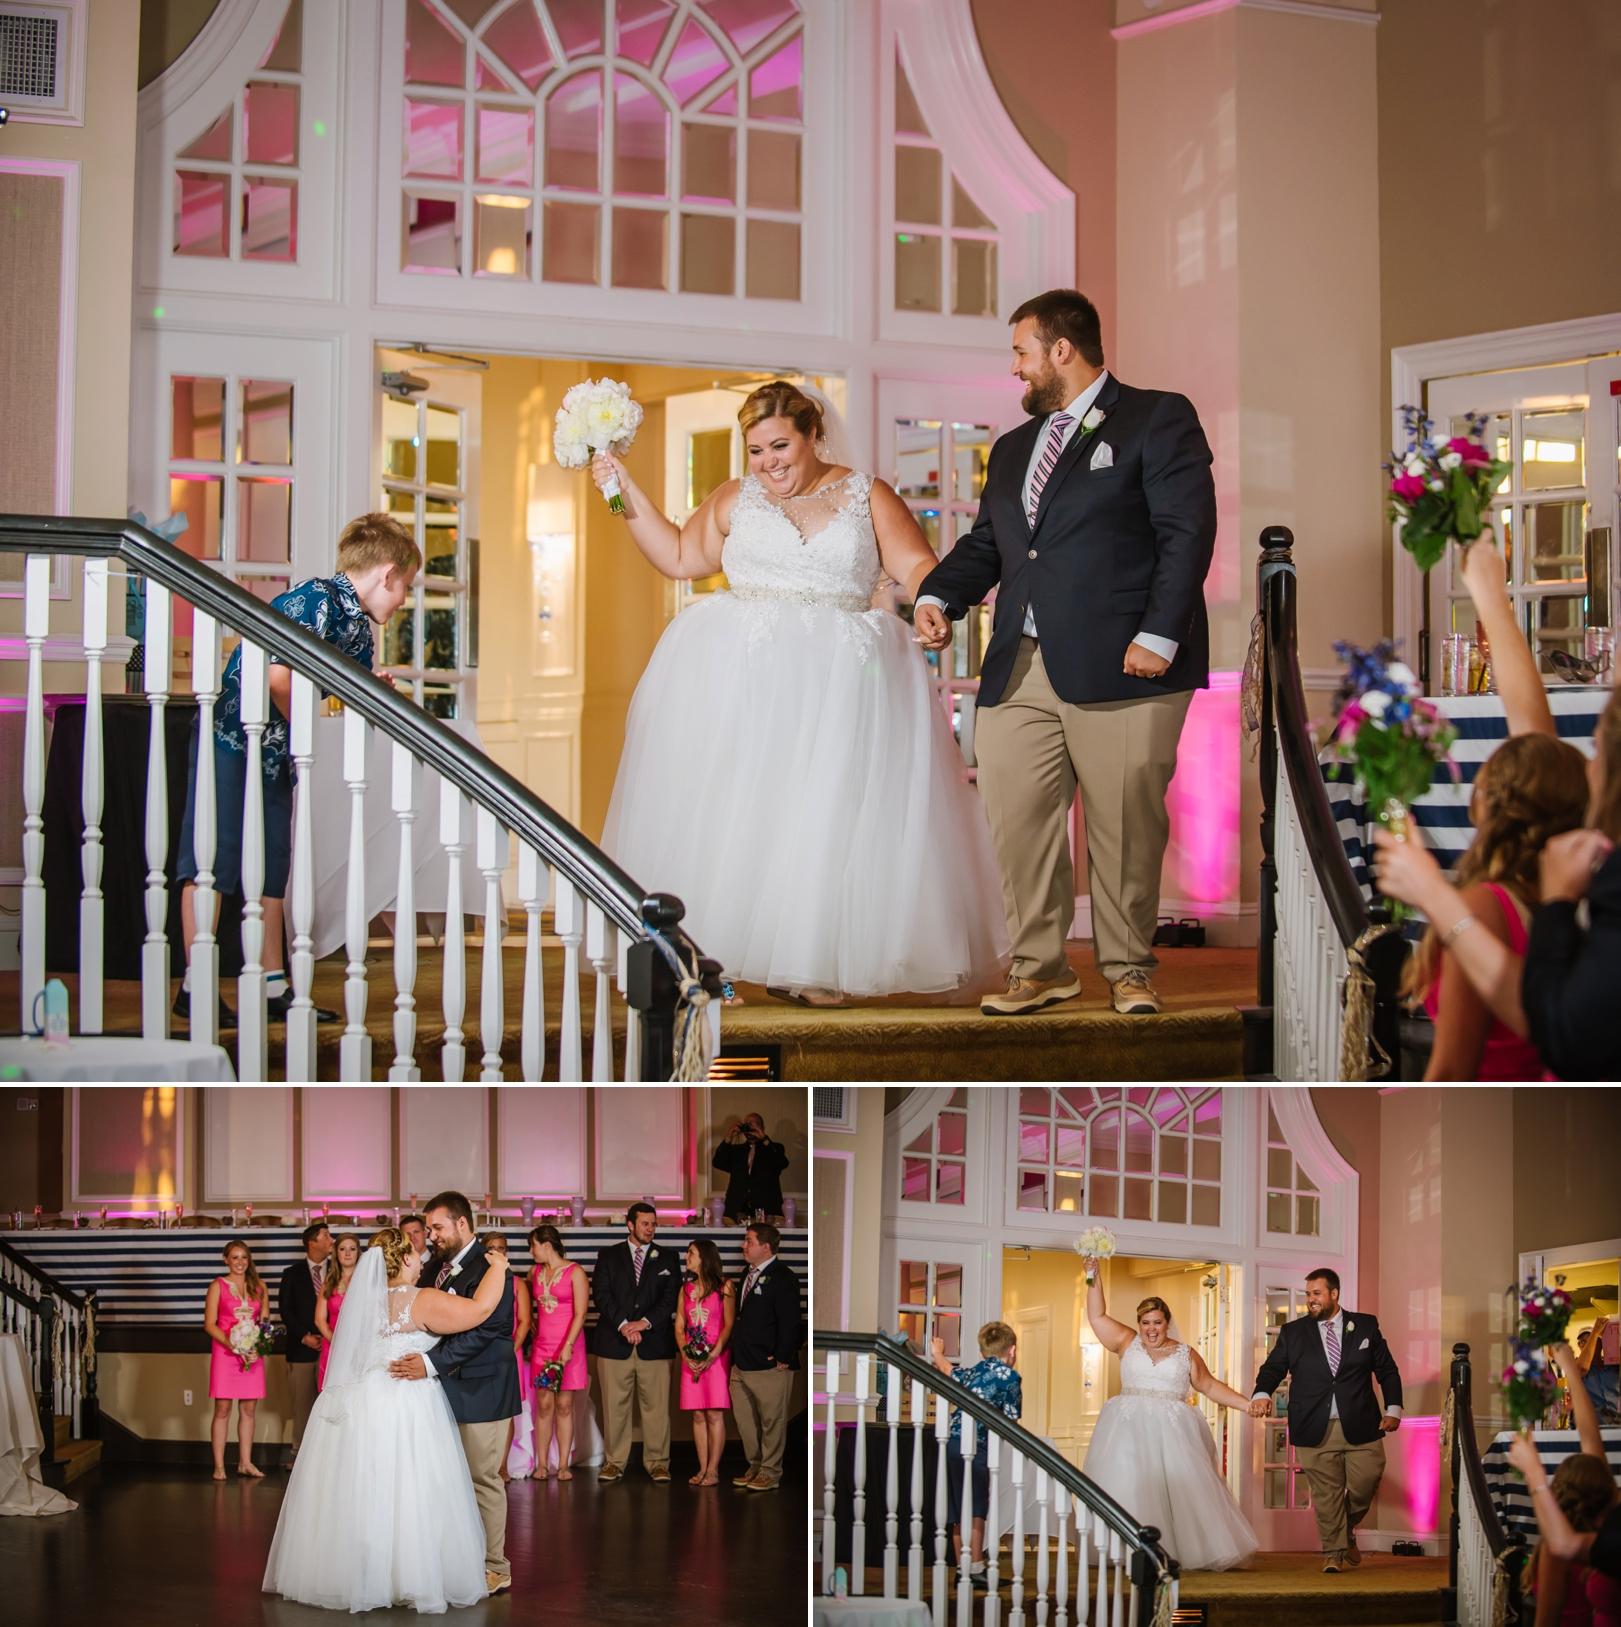 St-pete-wedding-photographer-don-caesar-ashlee-hamon_0029.jpg